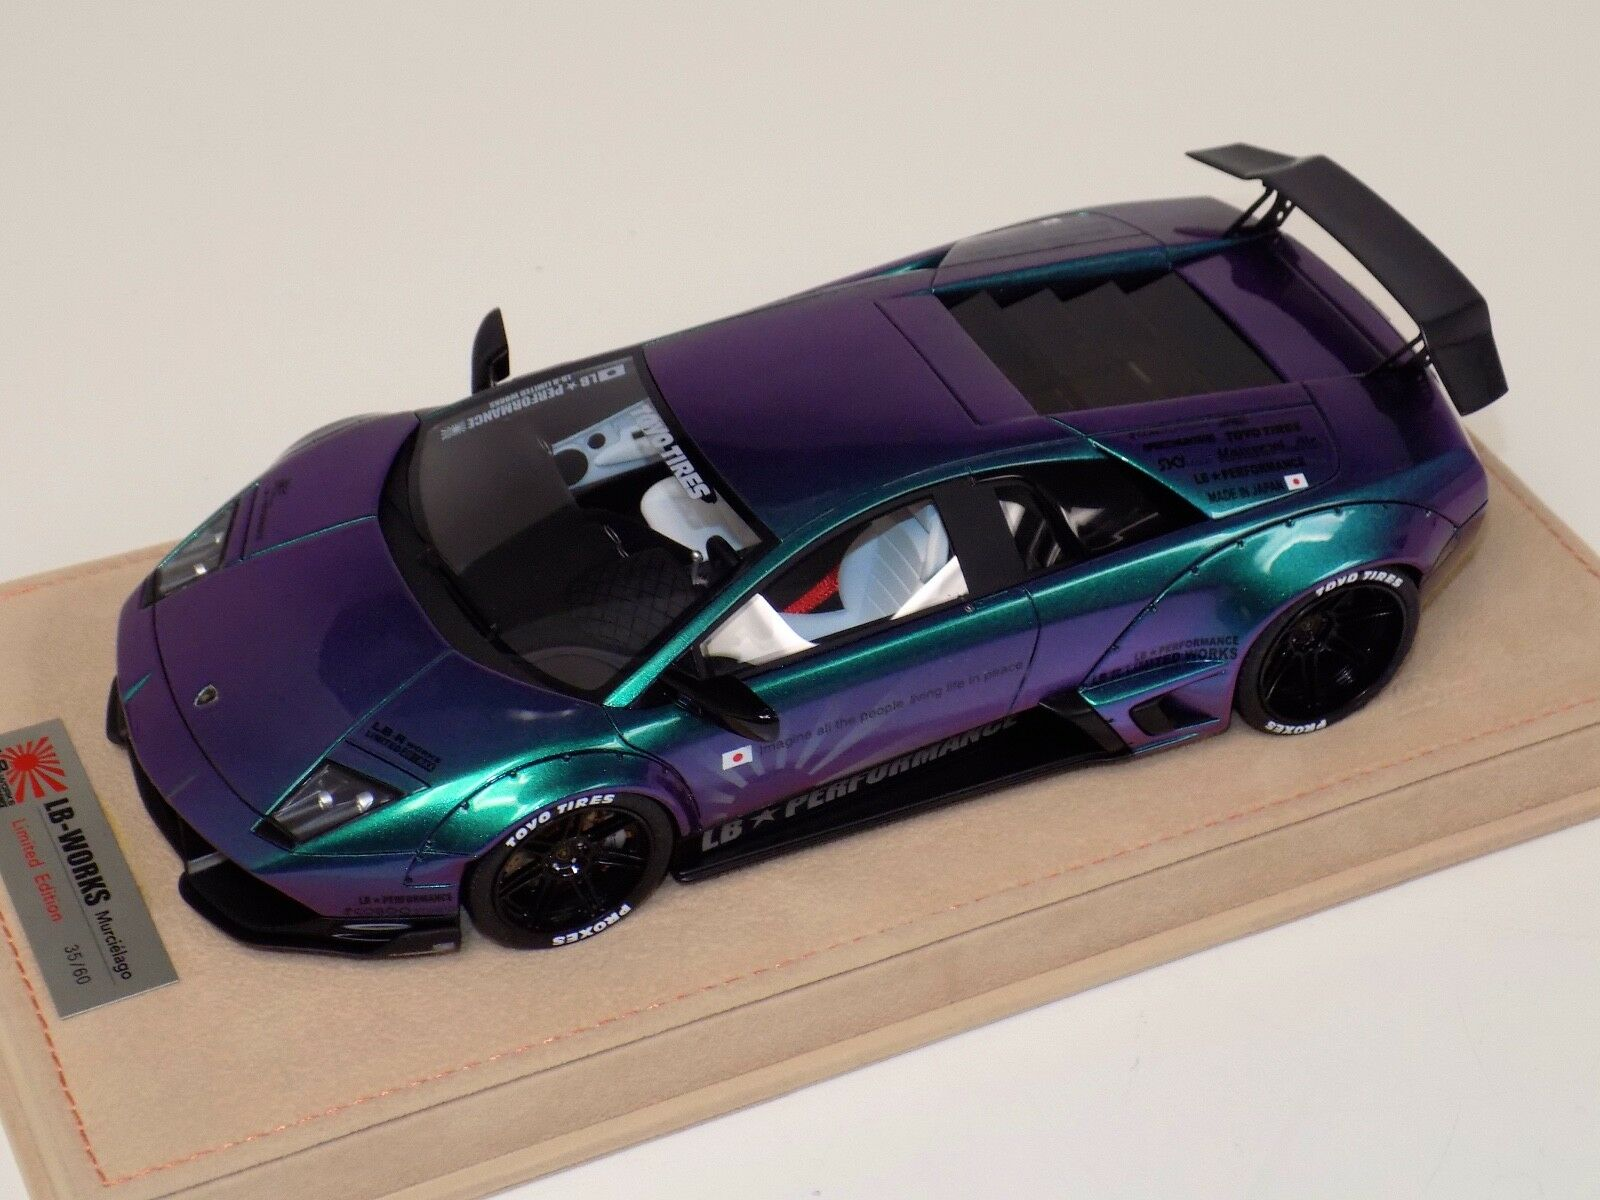 1/18 Lamborghini Murcielago Liberty Walk LB Performance in Chameleon  BBR or MR